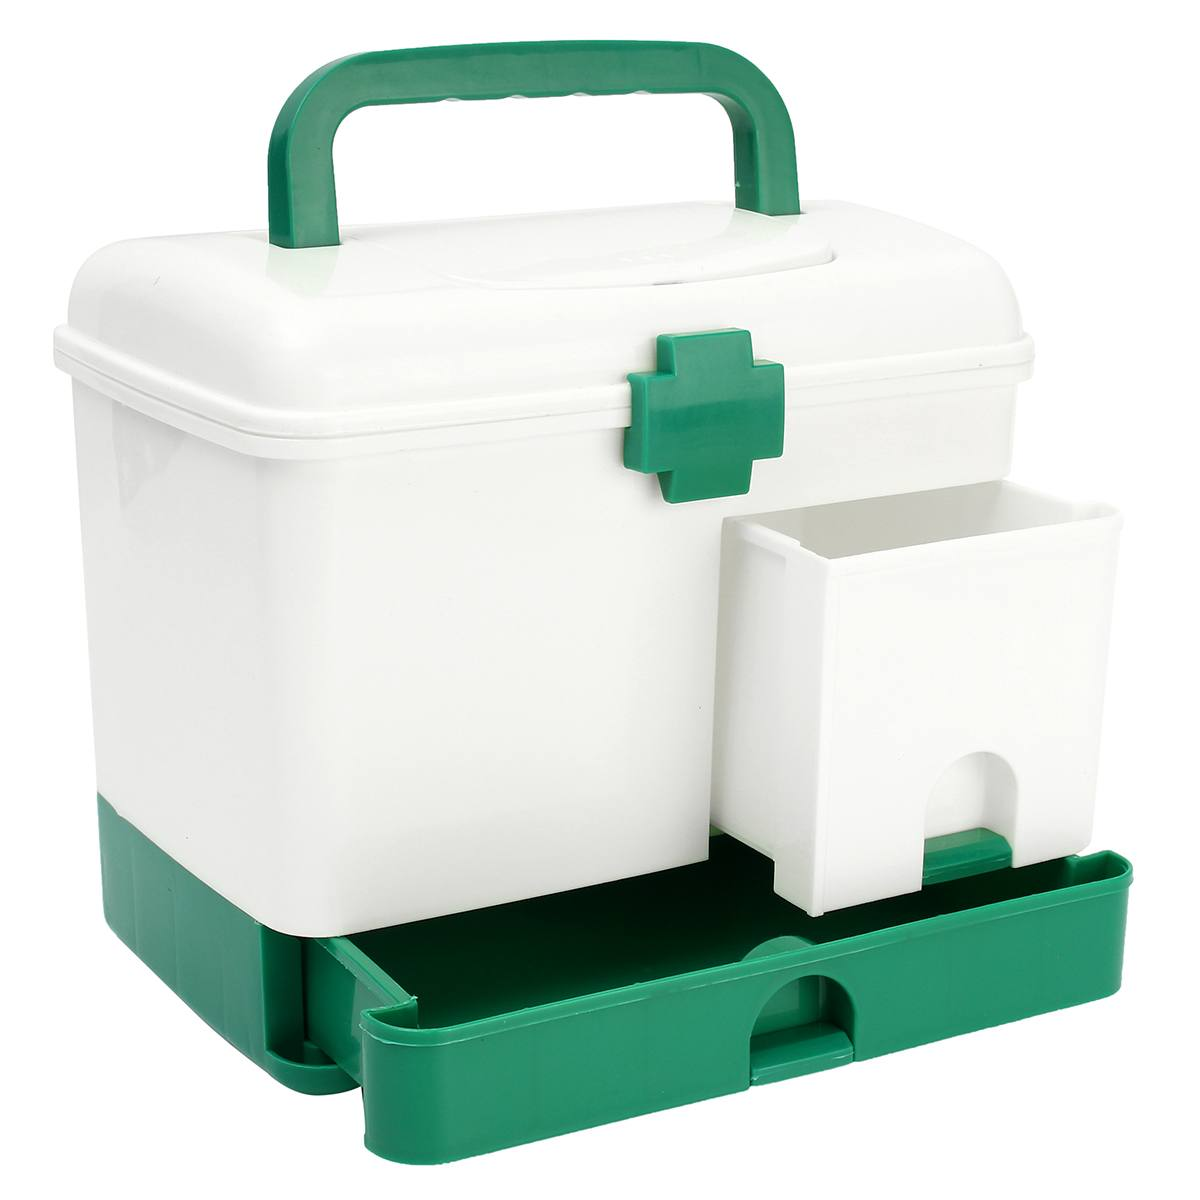 Caja de botiquín de uso doméstico de 3 capas, botiquín de primeros auxilios, organizador de compartimentos, estuche de modelo médico portátil de gran capacidad